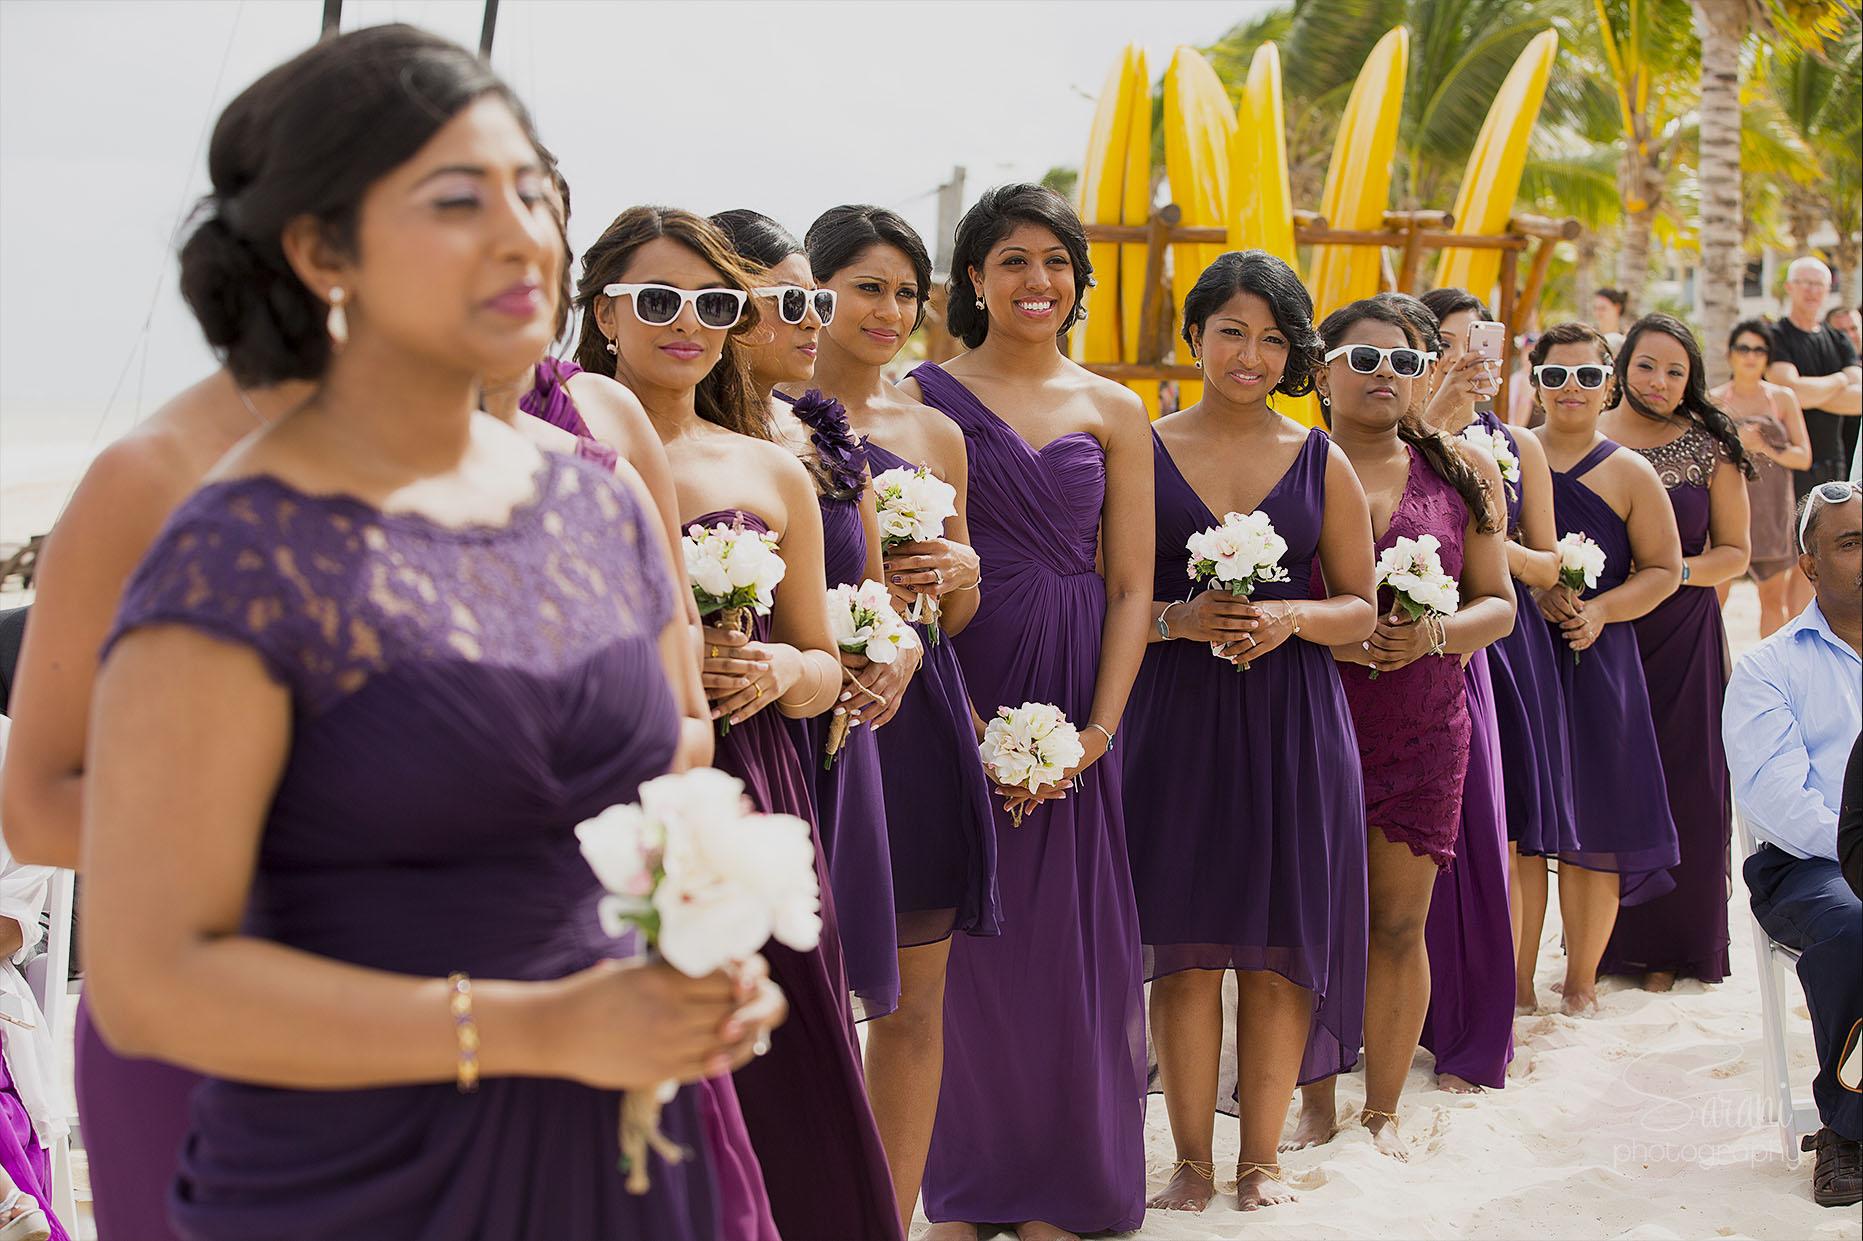 Royalton Riviera Cancun Wedding Photography